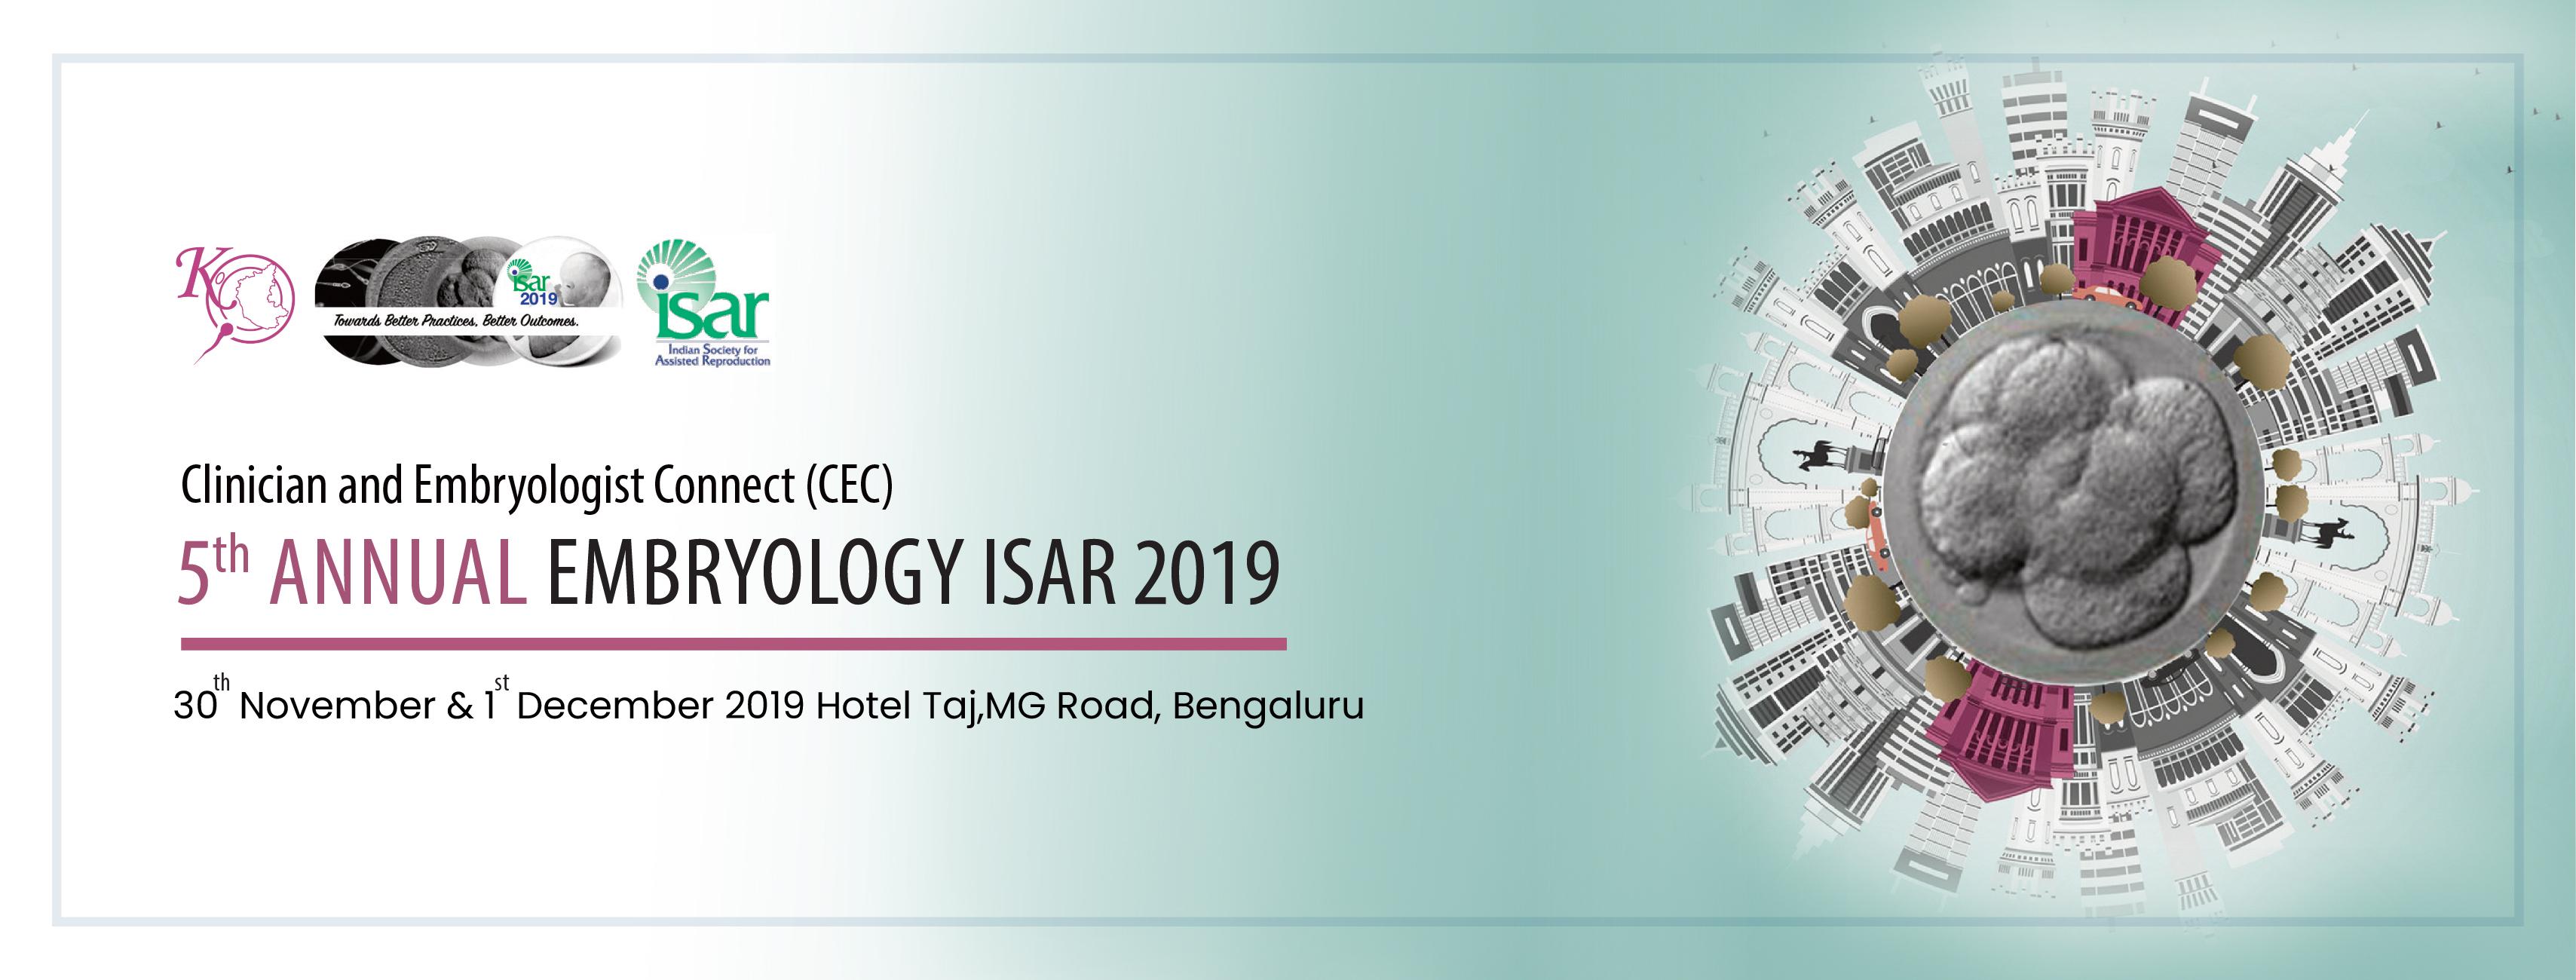 EMBRYOLOGY ISAR 2019